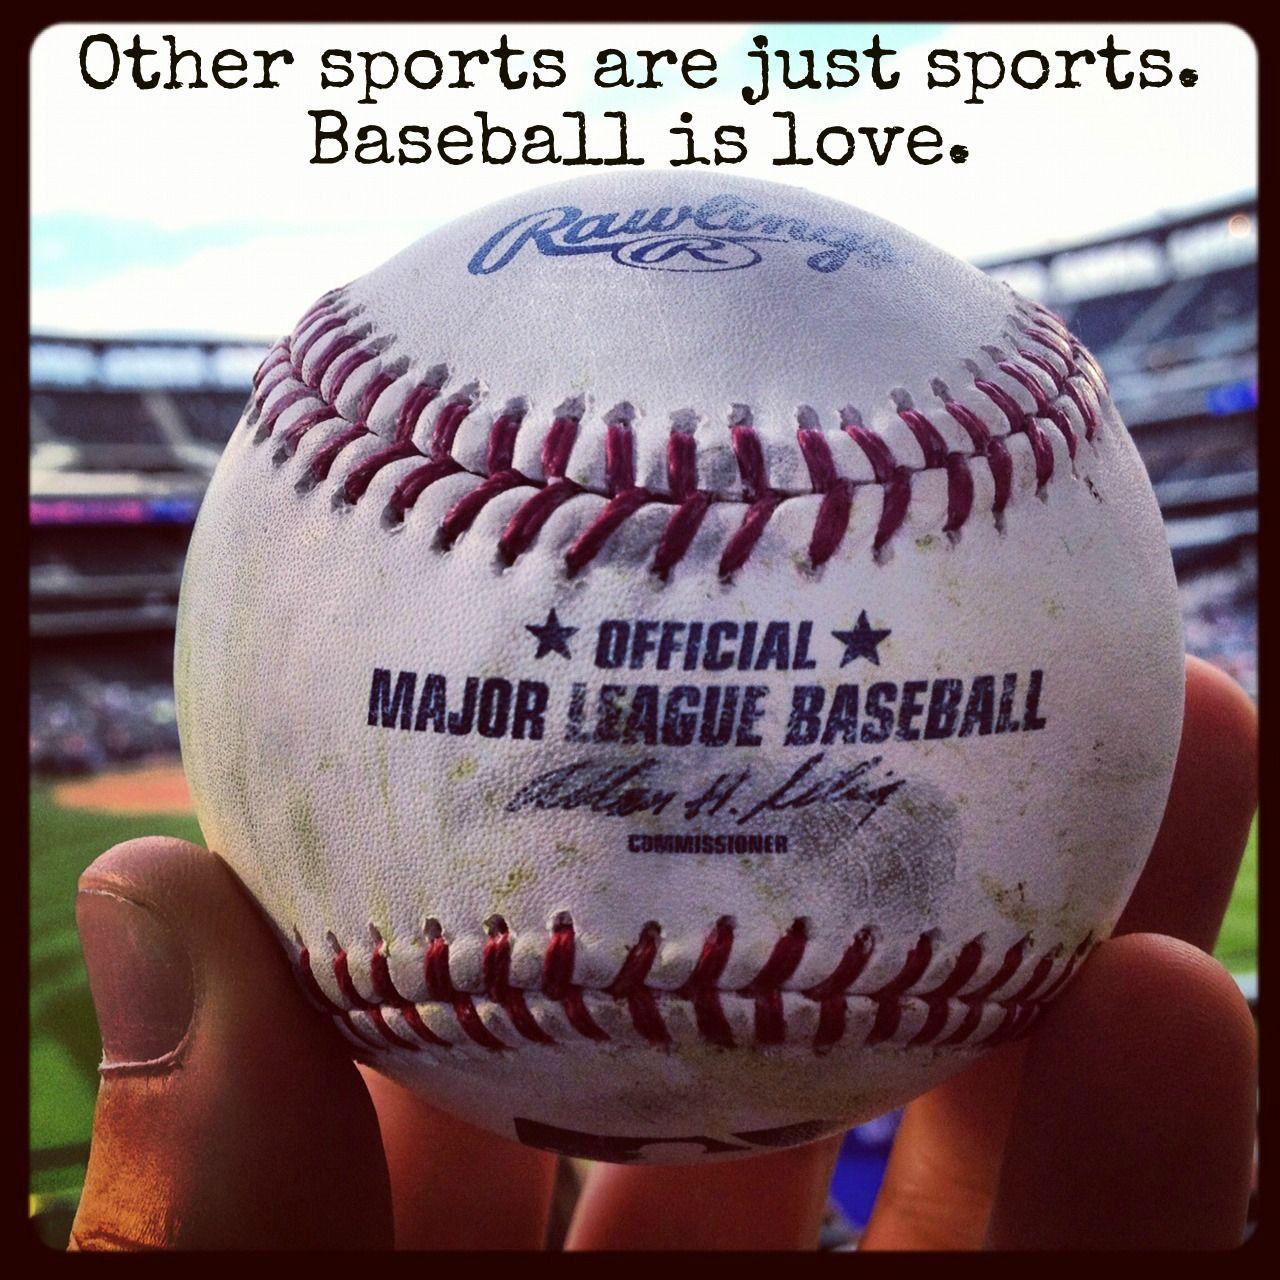 Mlb Com The Official Site Of Major League Baseball Baseball Quotes Baseball Memes Cardinals Baseball